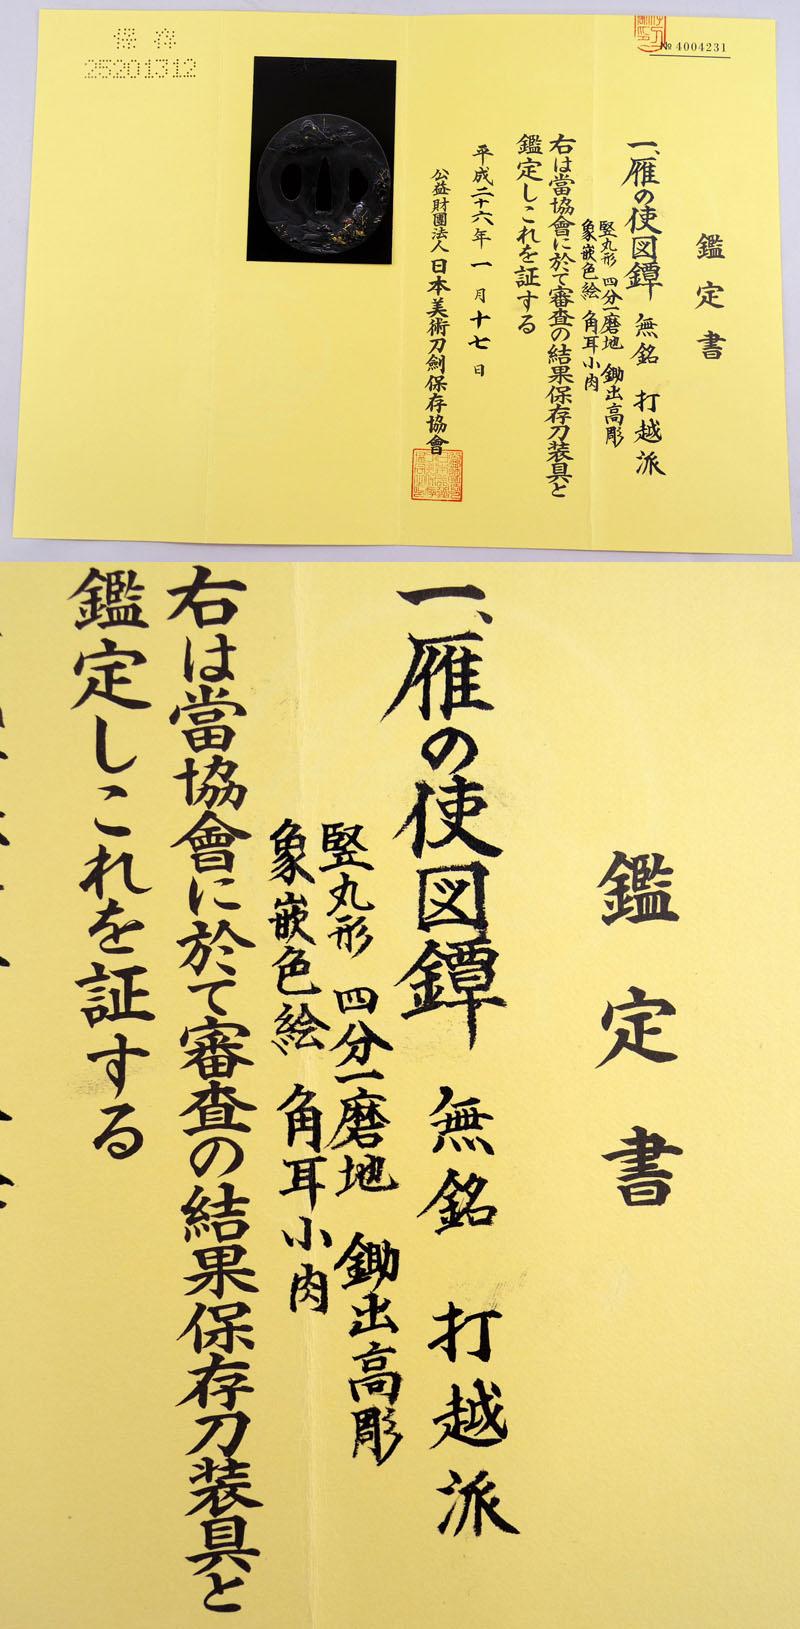 雁の使図鍔 無銘 打越派 Picture of Certificate